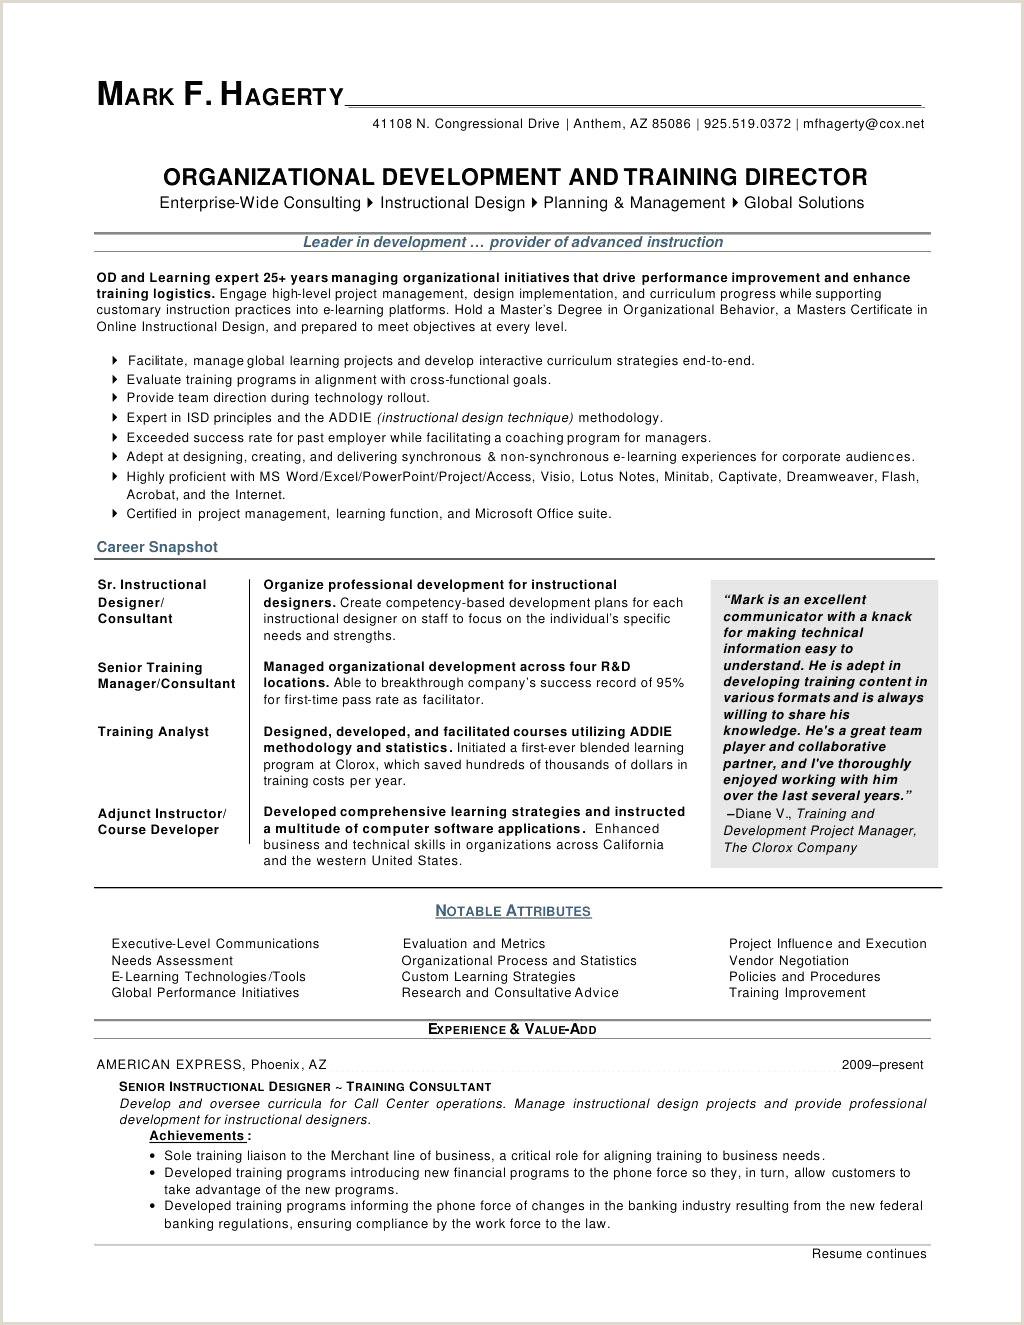 Cv Format For Job Cv For Job Gratuit Prehensive Cv Template First Time Resume